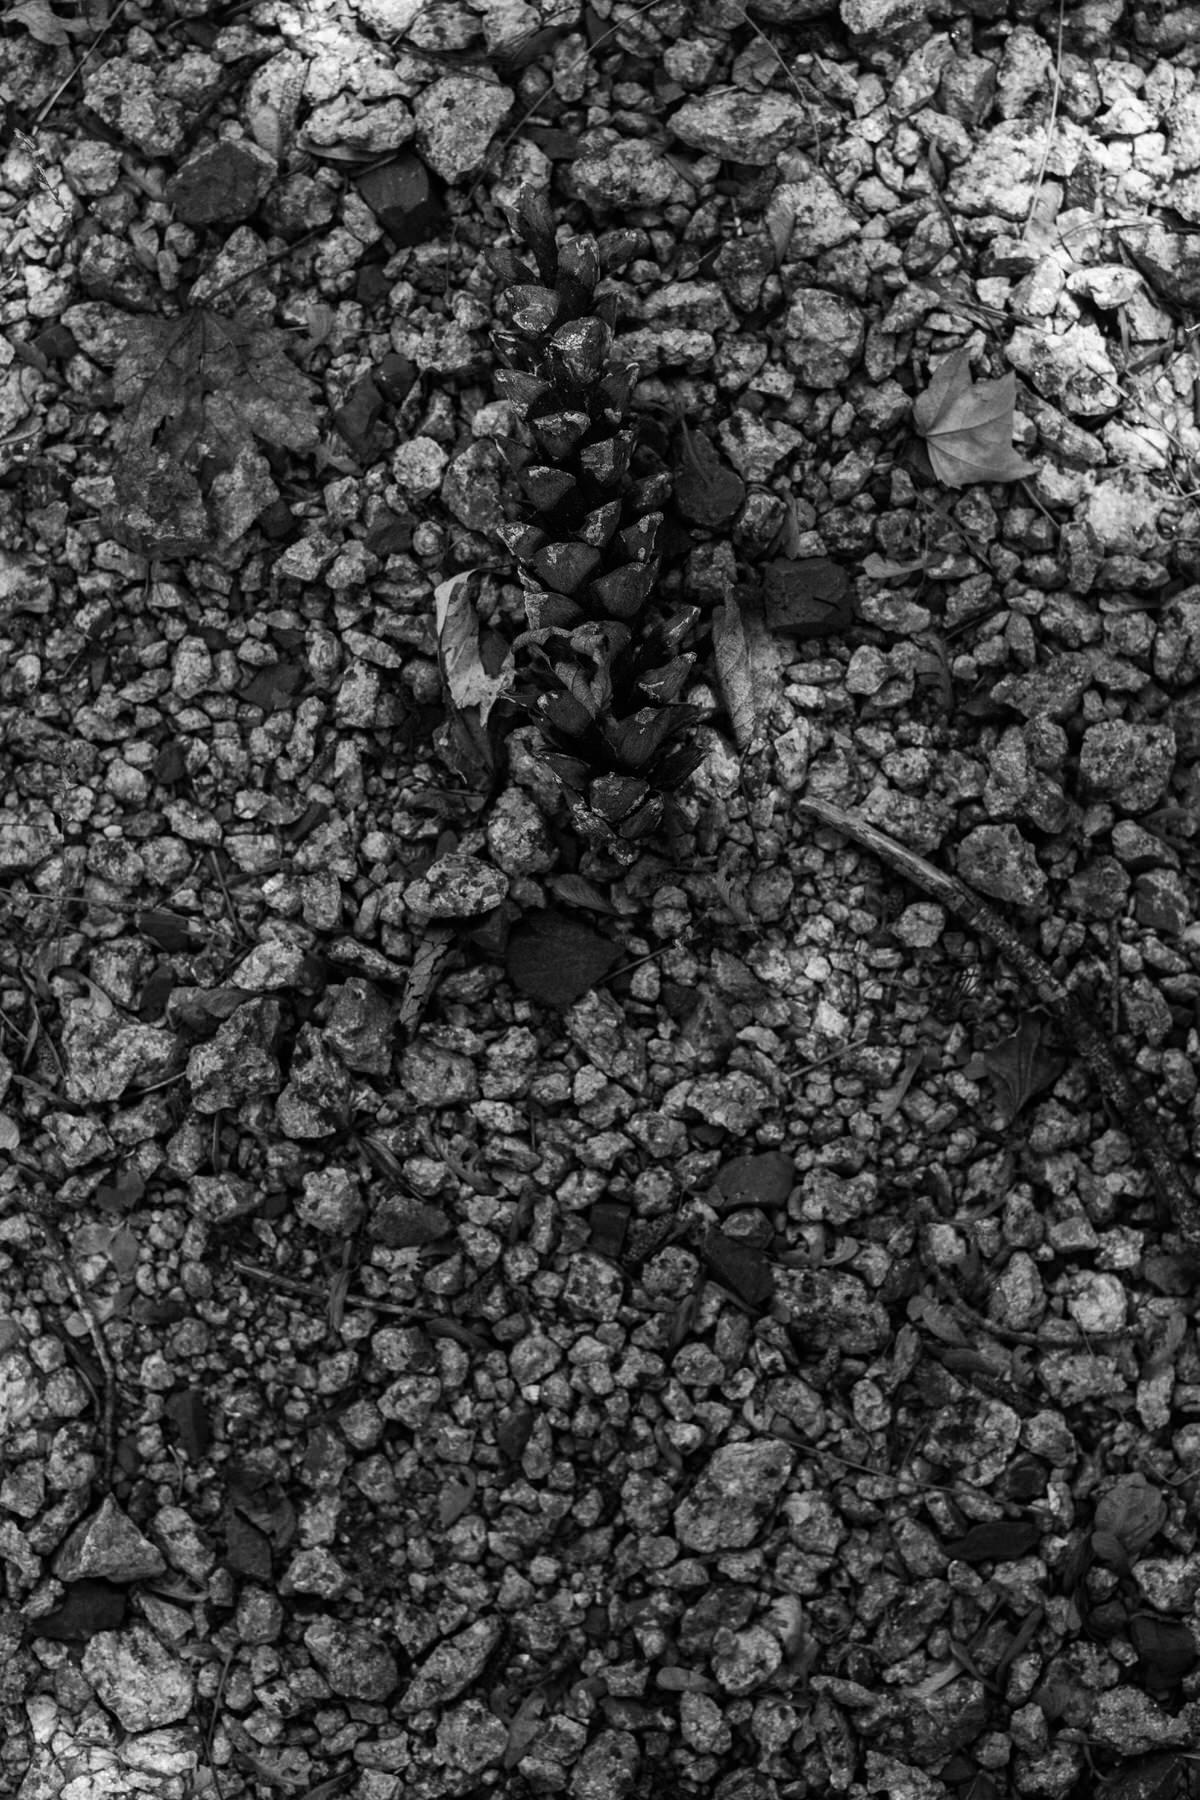 mini-golf-Crivitz-Wisconsin-black-and-white-fine-art-photography-by-Studio-L-photographer-Laura-Schneider-_9668